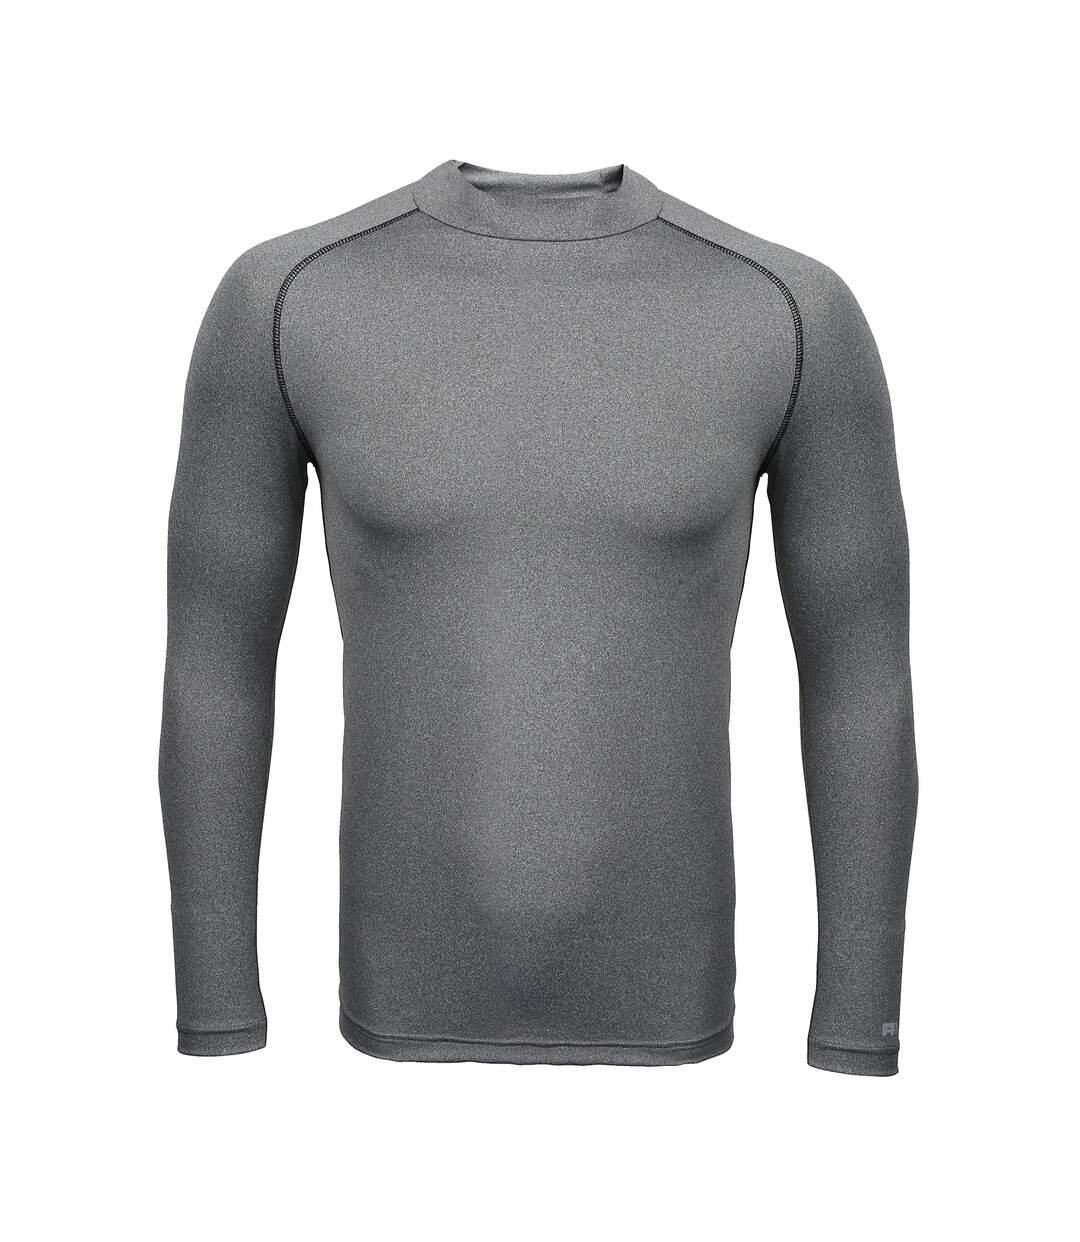 Rhino Mens Thermal Underwear Long Sleeve Base Layer Vest Top (Heather Grey) - UTRW1276